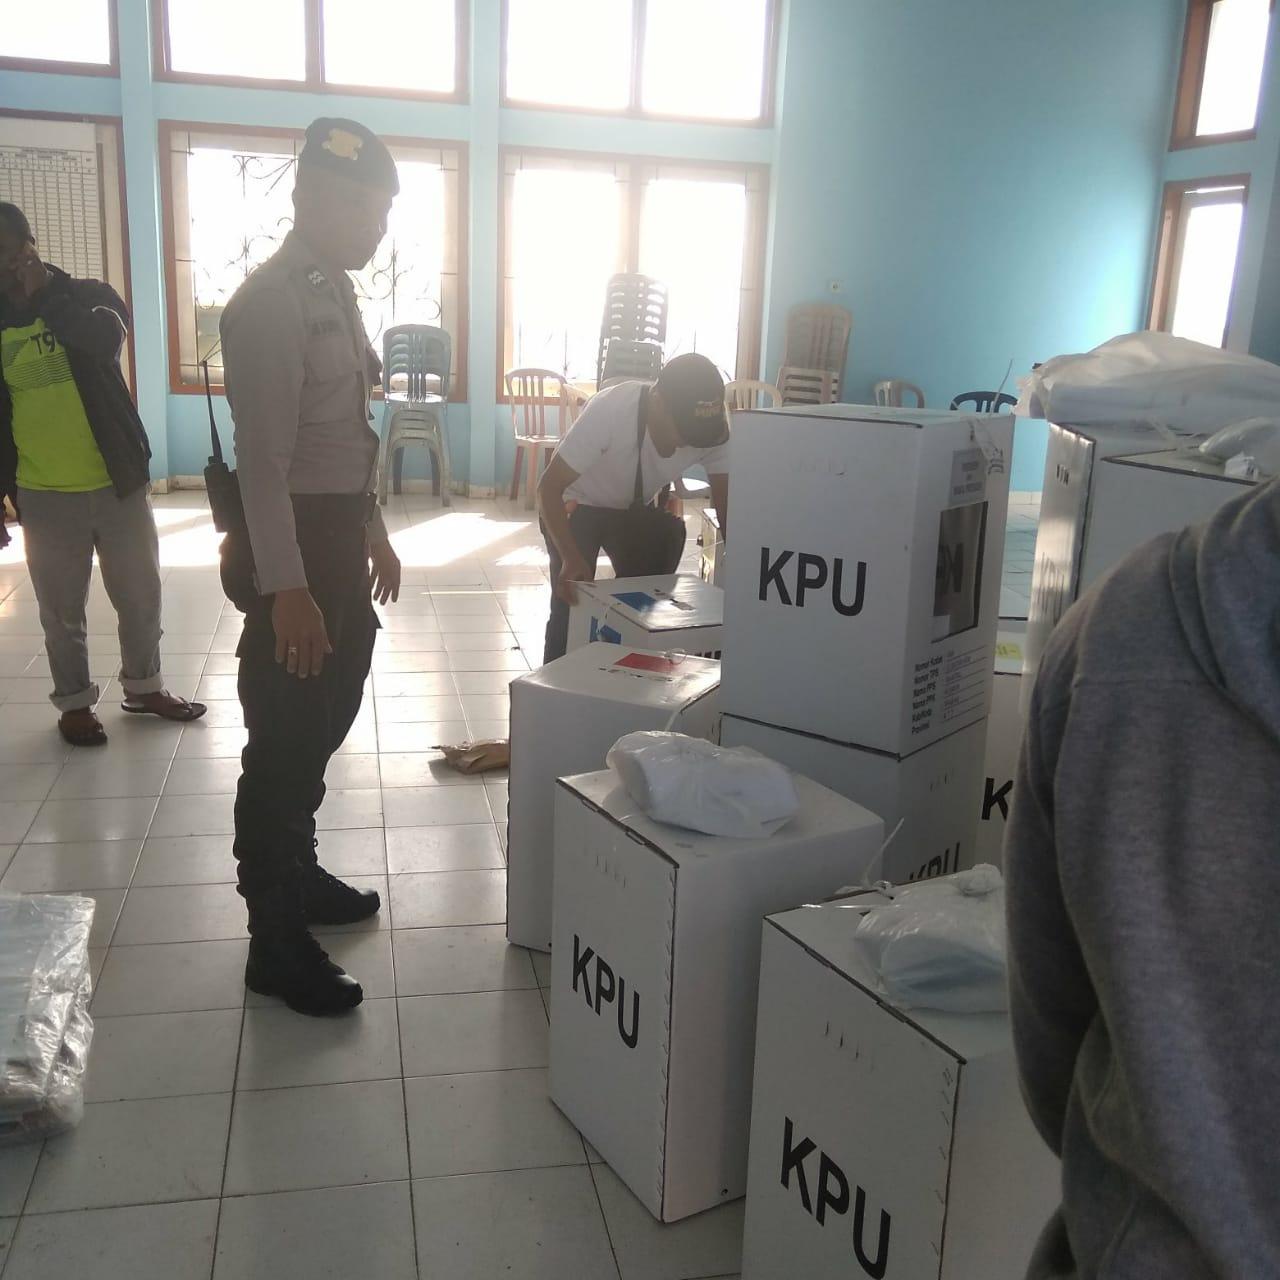 Polres Mabar Kawal Penyaluran Logistik Pemilu 2019 Ke Kecamatan Kuwus